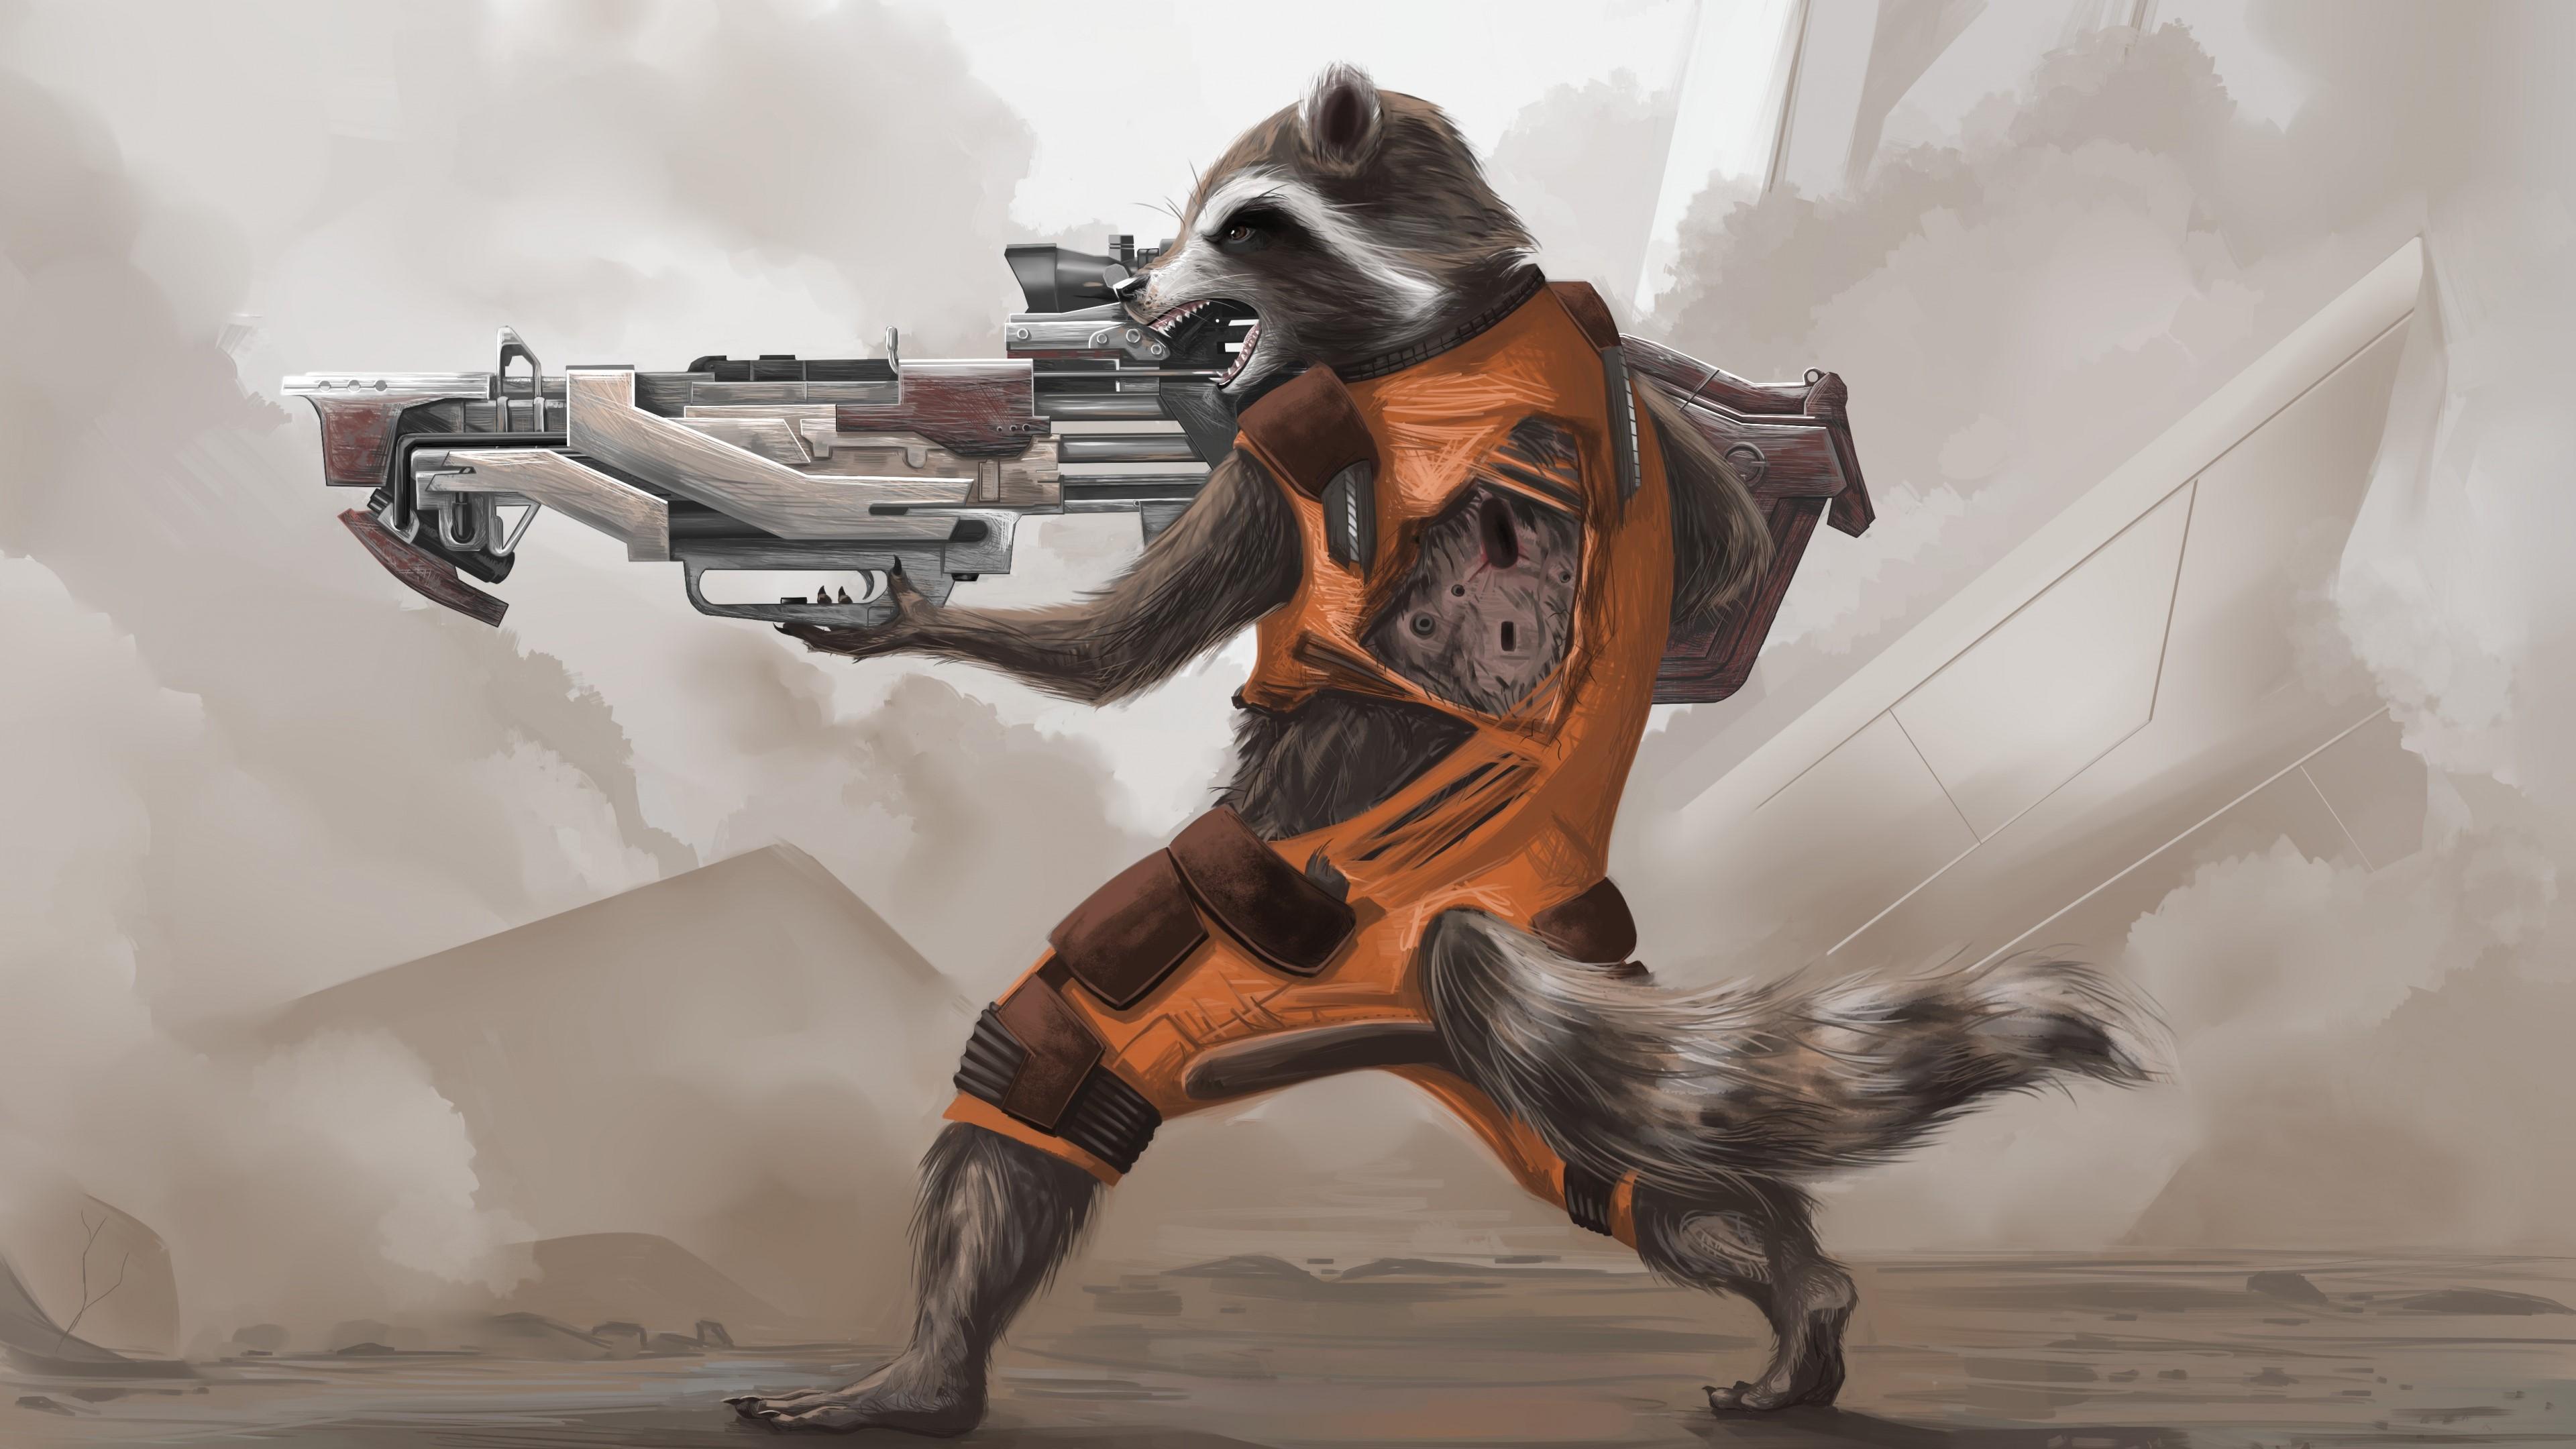 Wallpaper Rocket Raccoon De Guardianes De La Galaxia - Rocket Raccoon Artwork , HD Wallpaper & Backgrounds